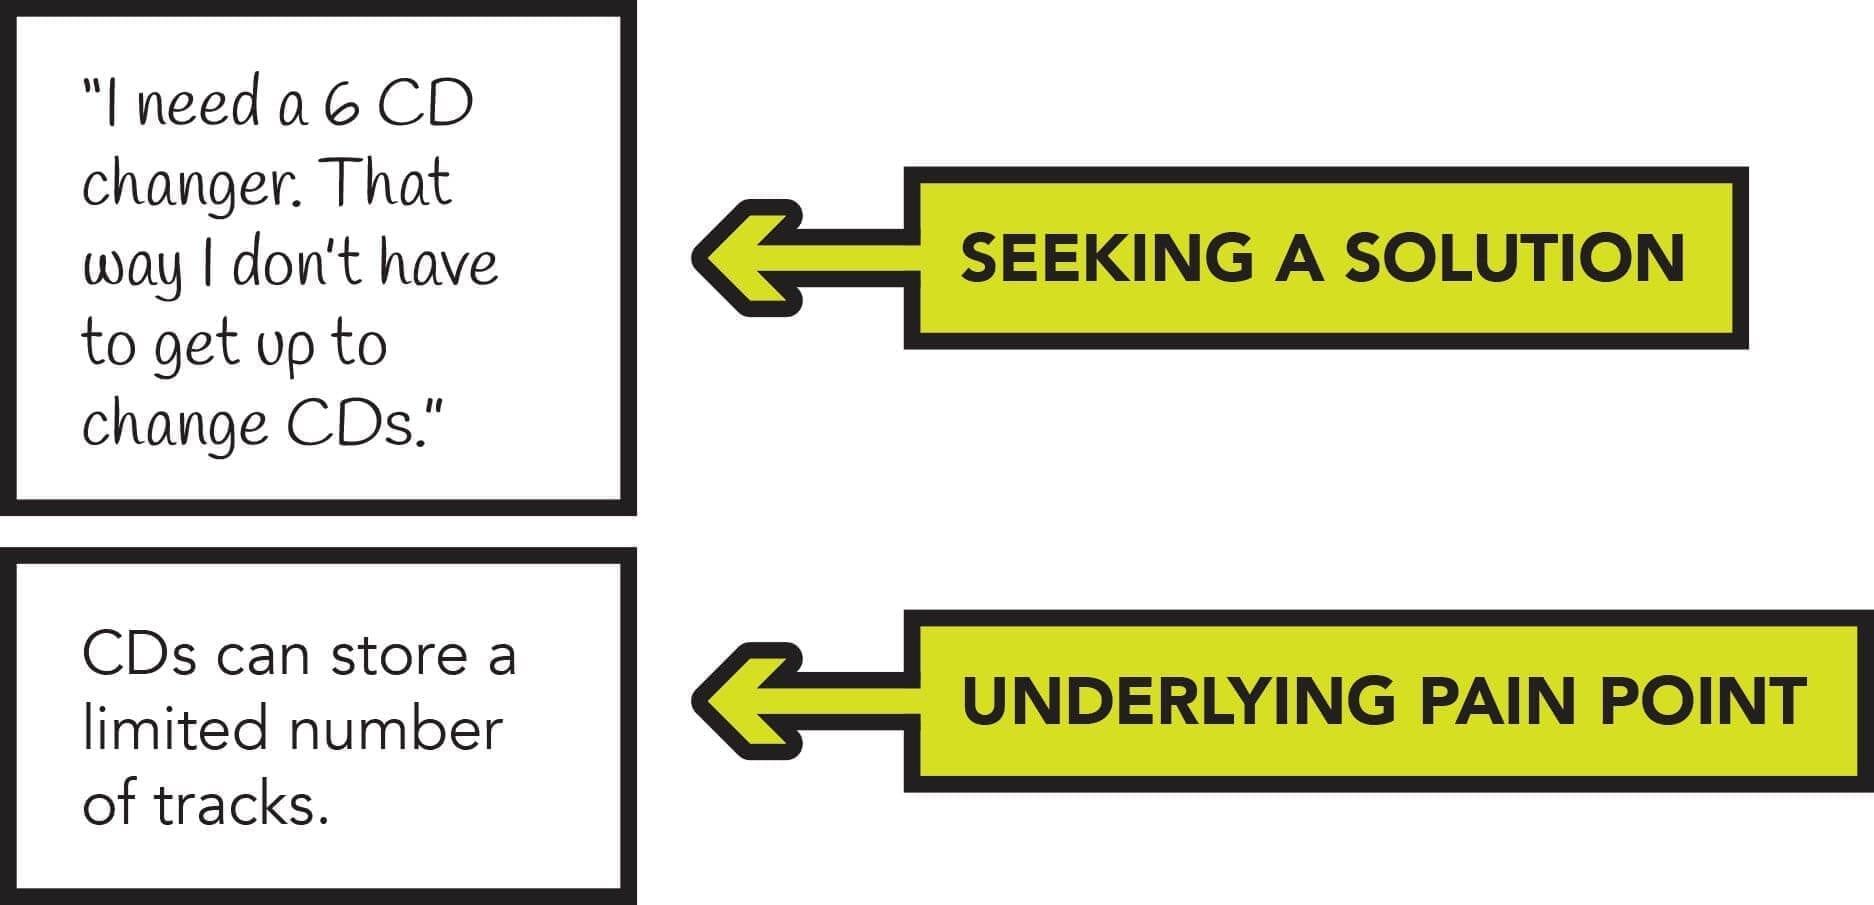 Often, solution-seeking reflects a deeper underlying pain point.